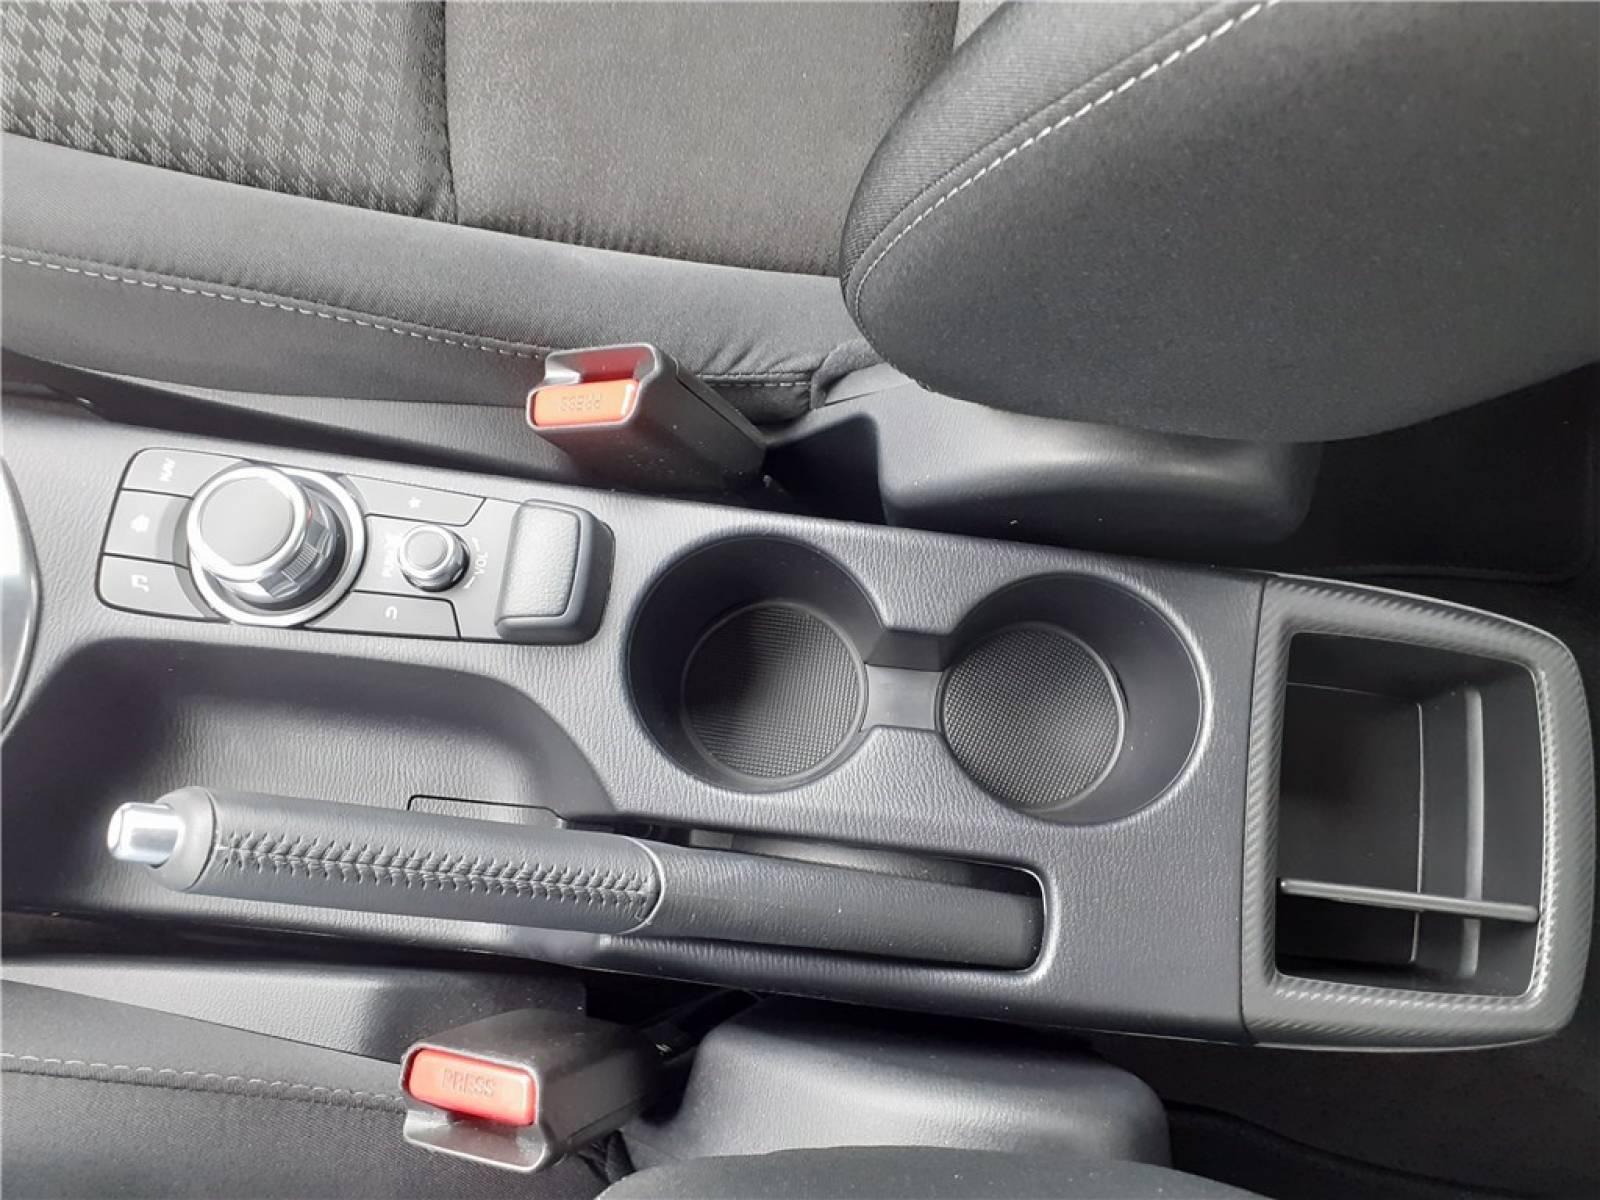 MAZDA Mazda2 1.5L SKYACTIV-G 90ch - véhicule d'occasion - Groupe Guillet - Chalon Automobiles - 71100 - Chalon-sur-Saône - 25